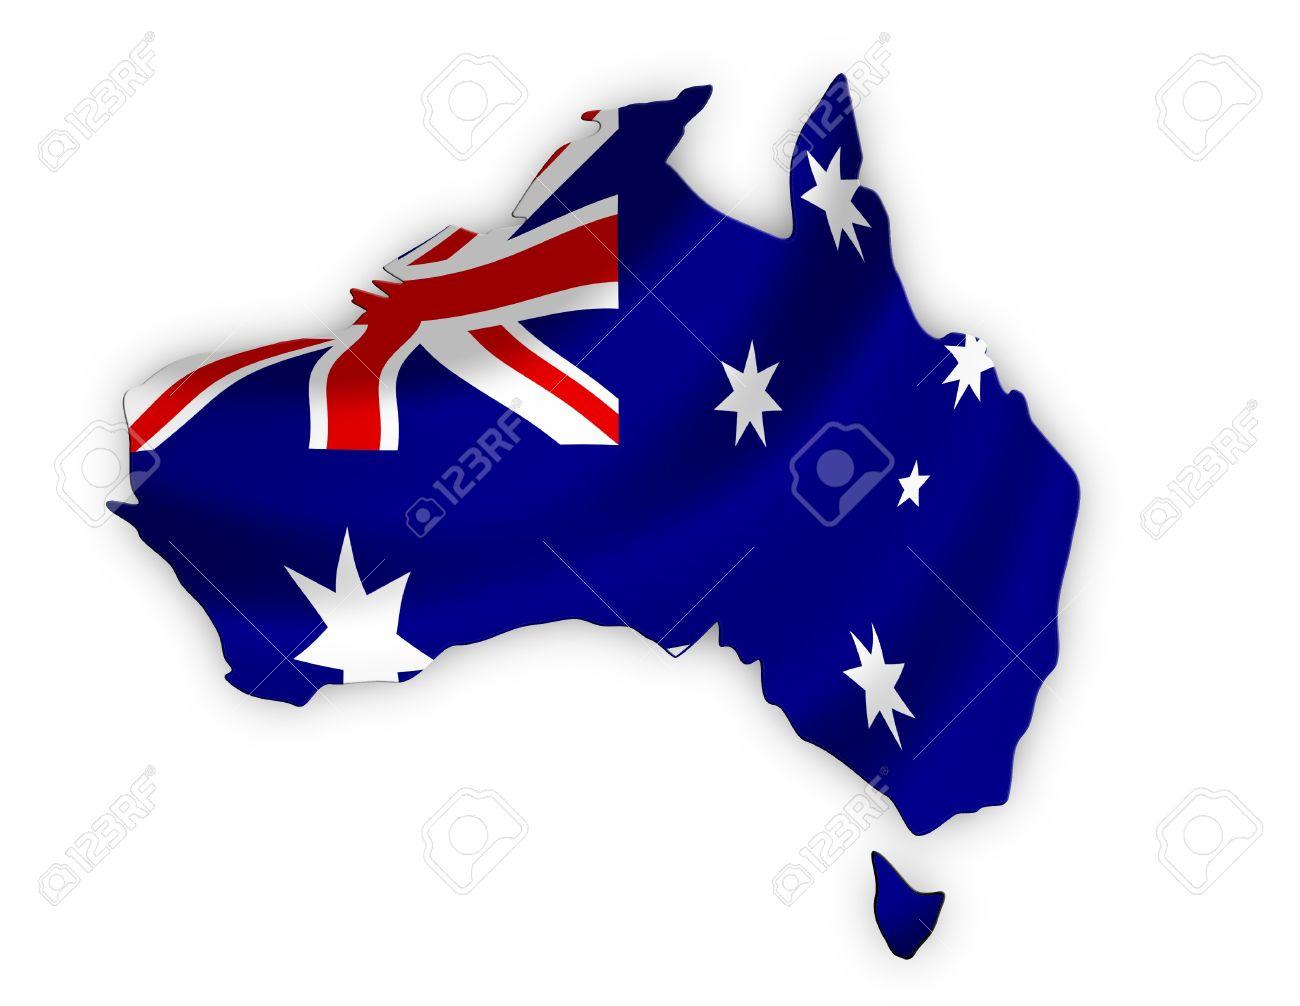 Australian Flag in the shape of Australia including Tasmania Stock Photo - 17129261